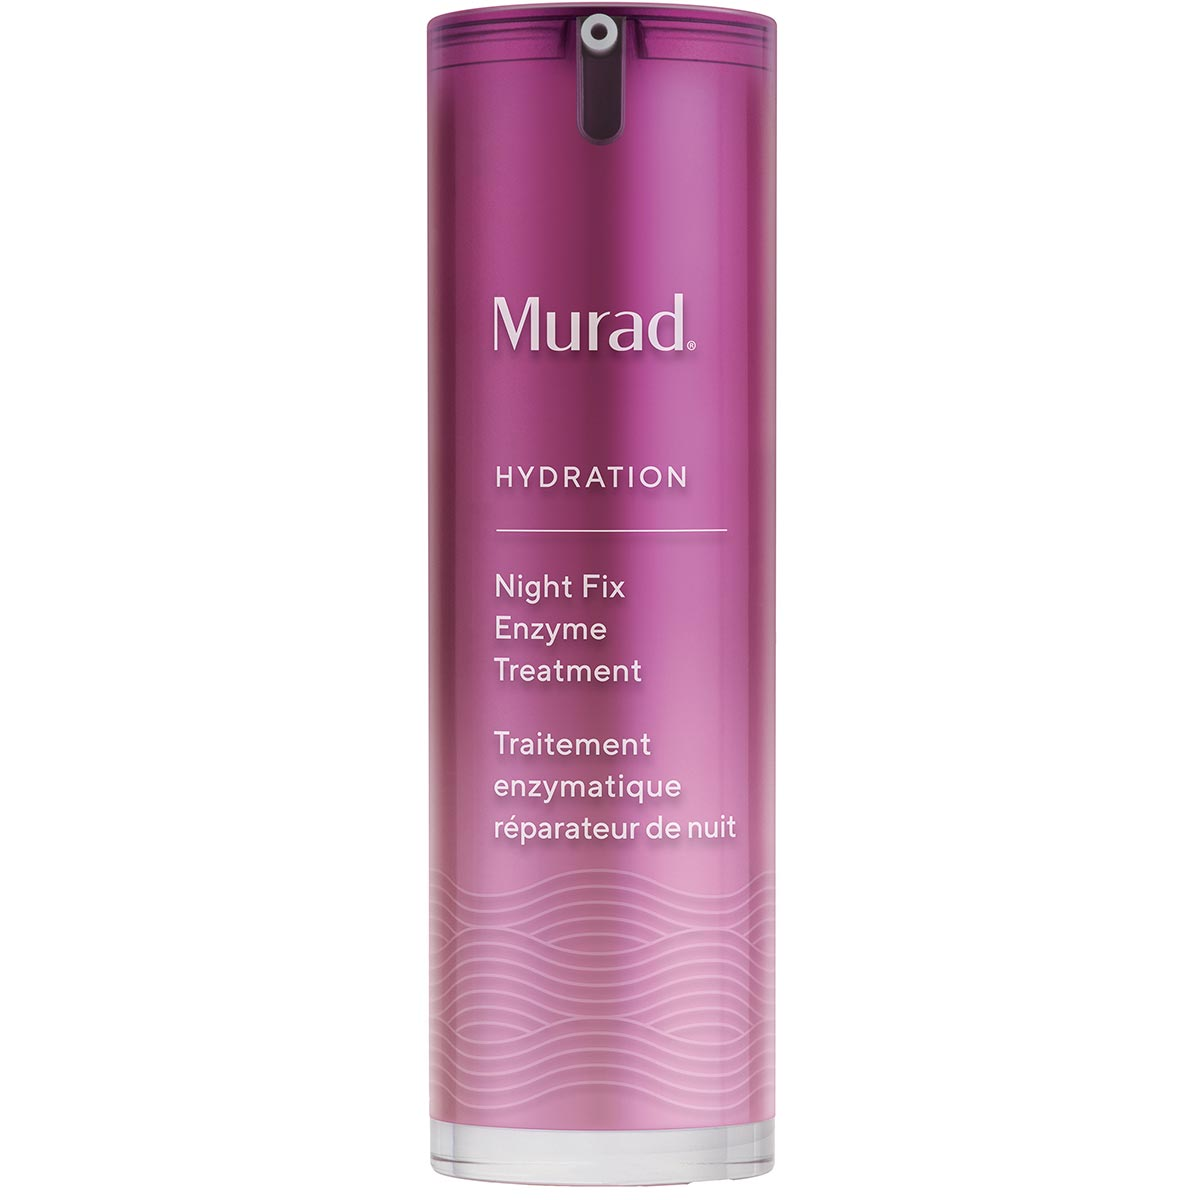 Night Fix Enzyme Treatment, 30 ml Murad Nattkräm